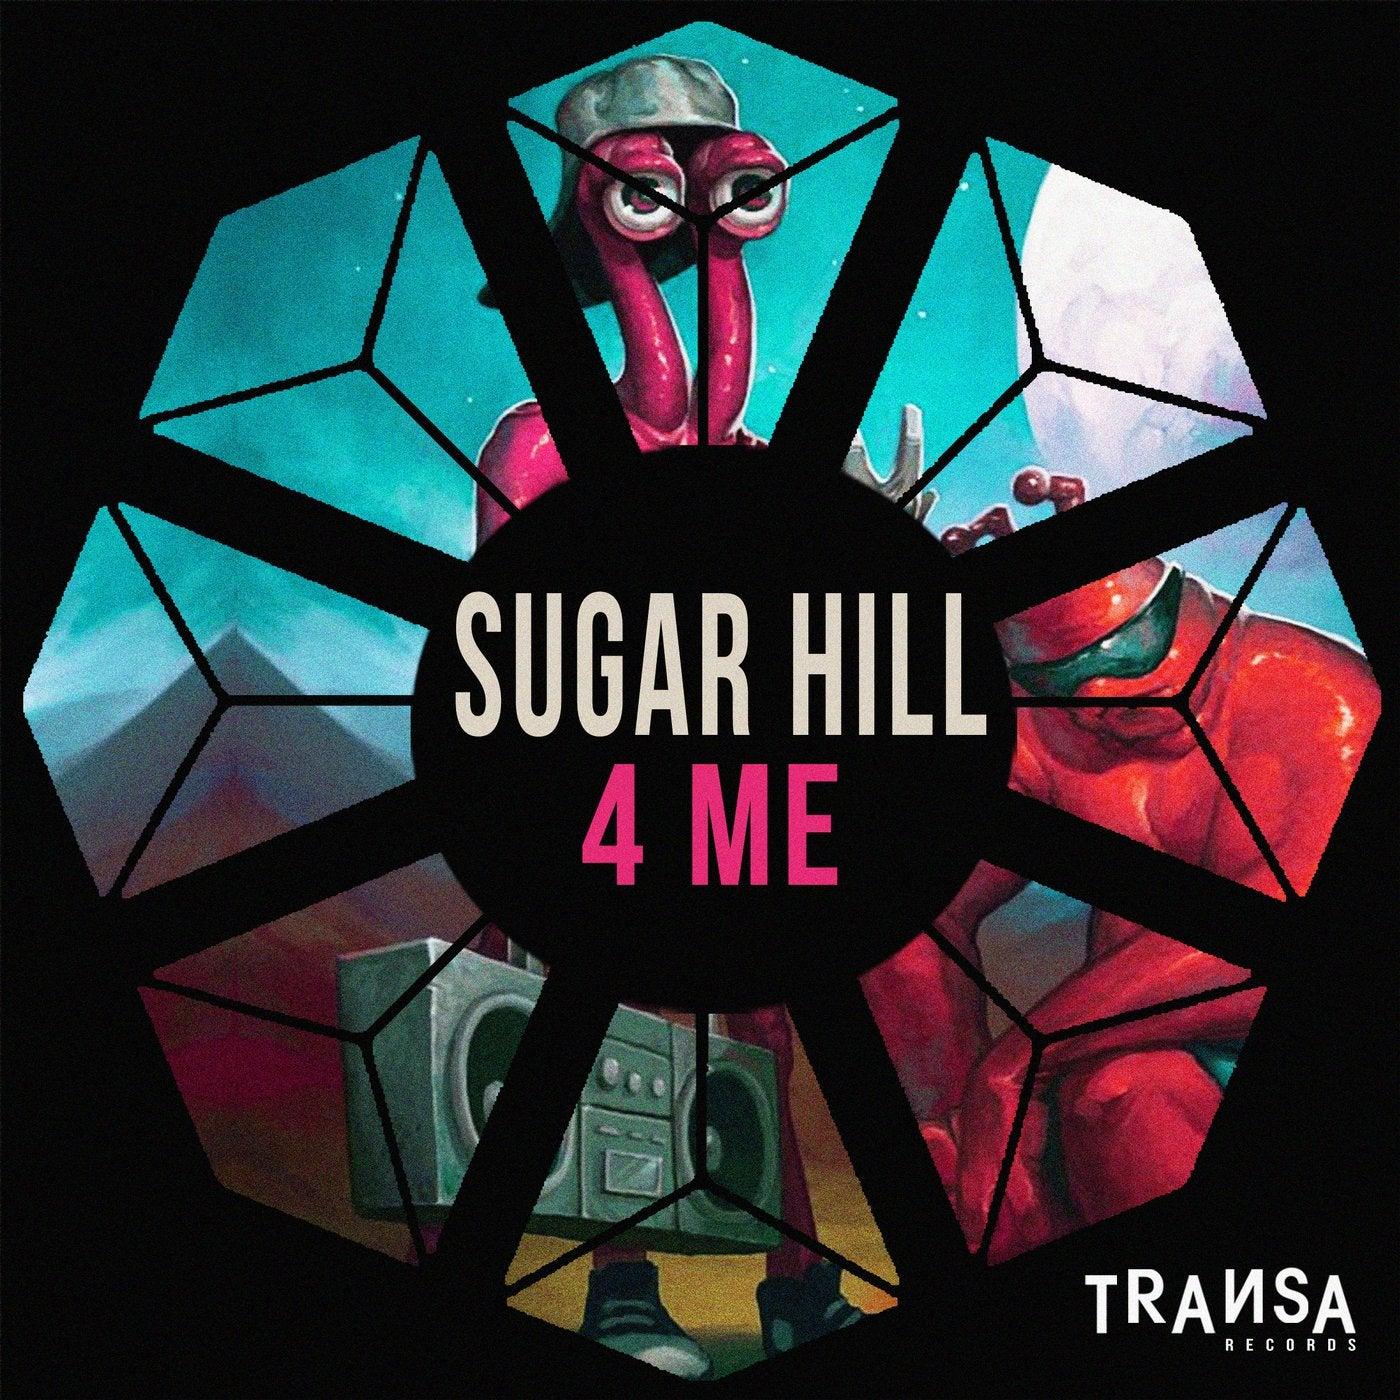 4 me (Original Mix)